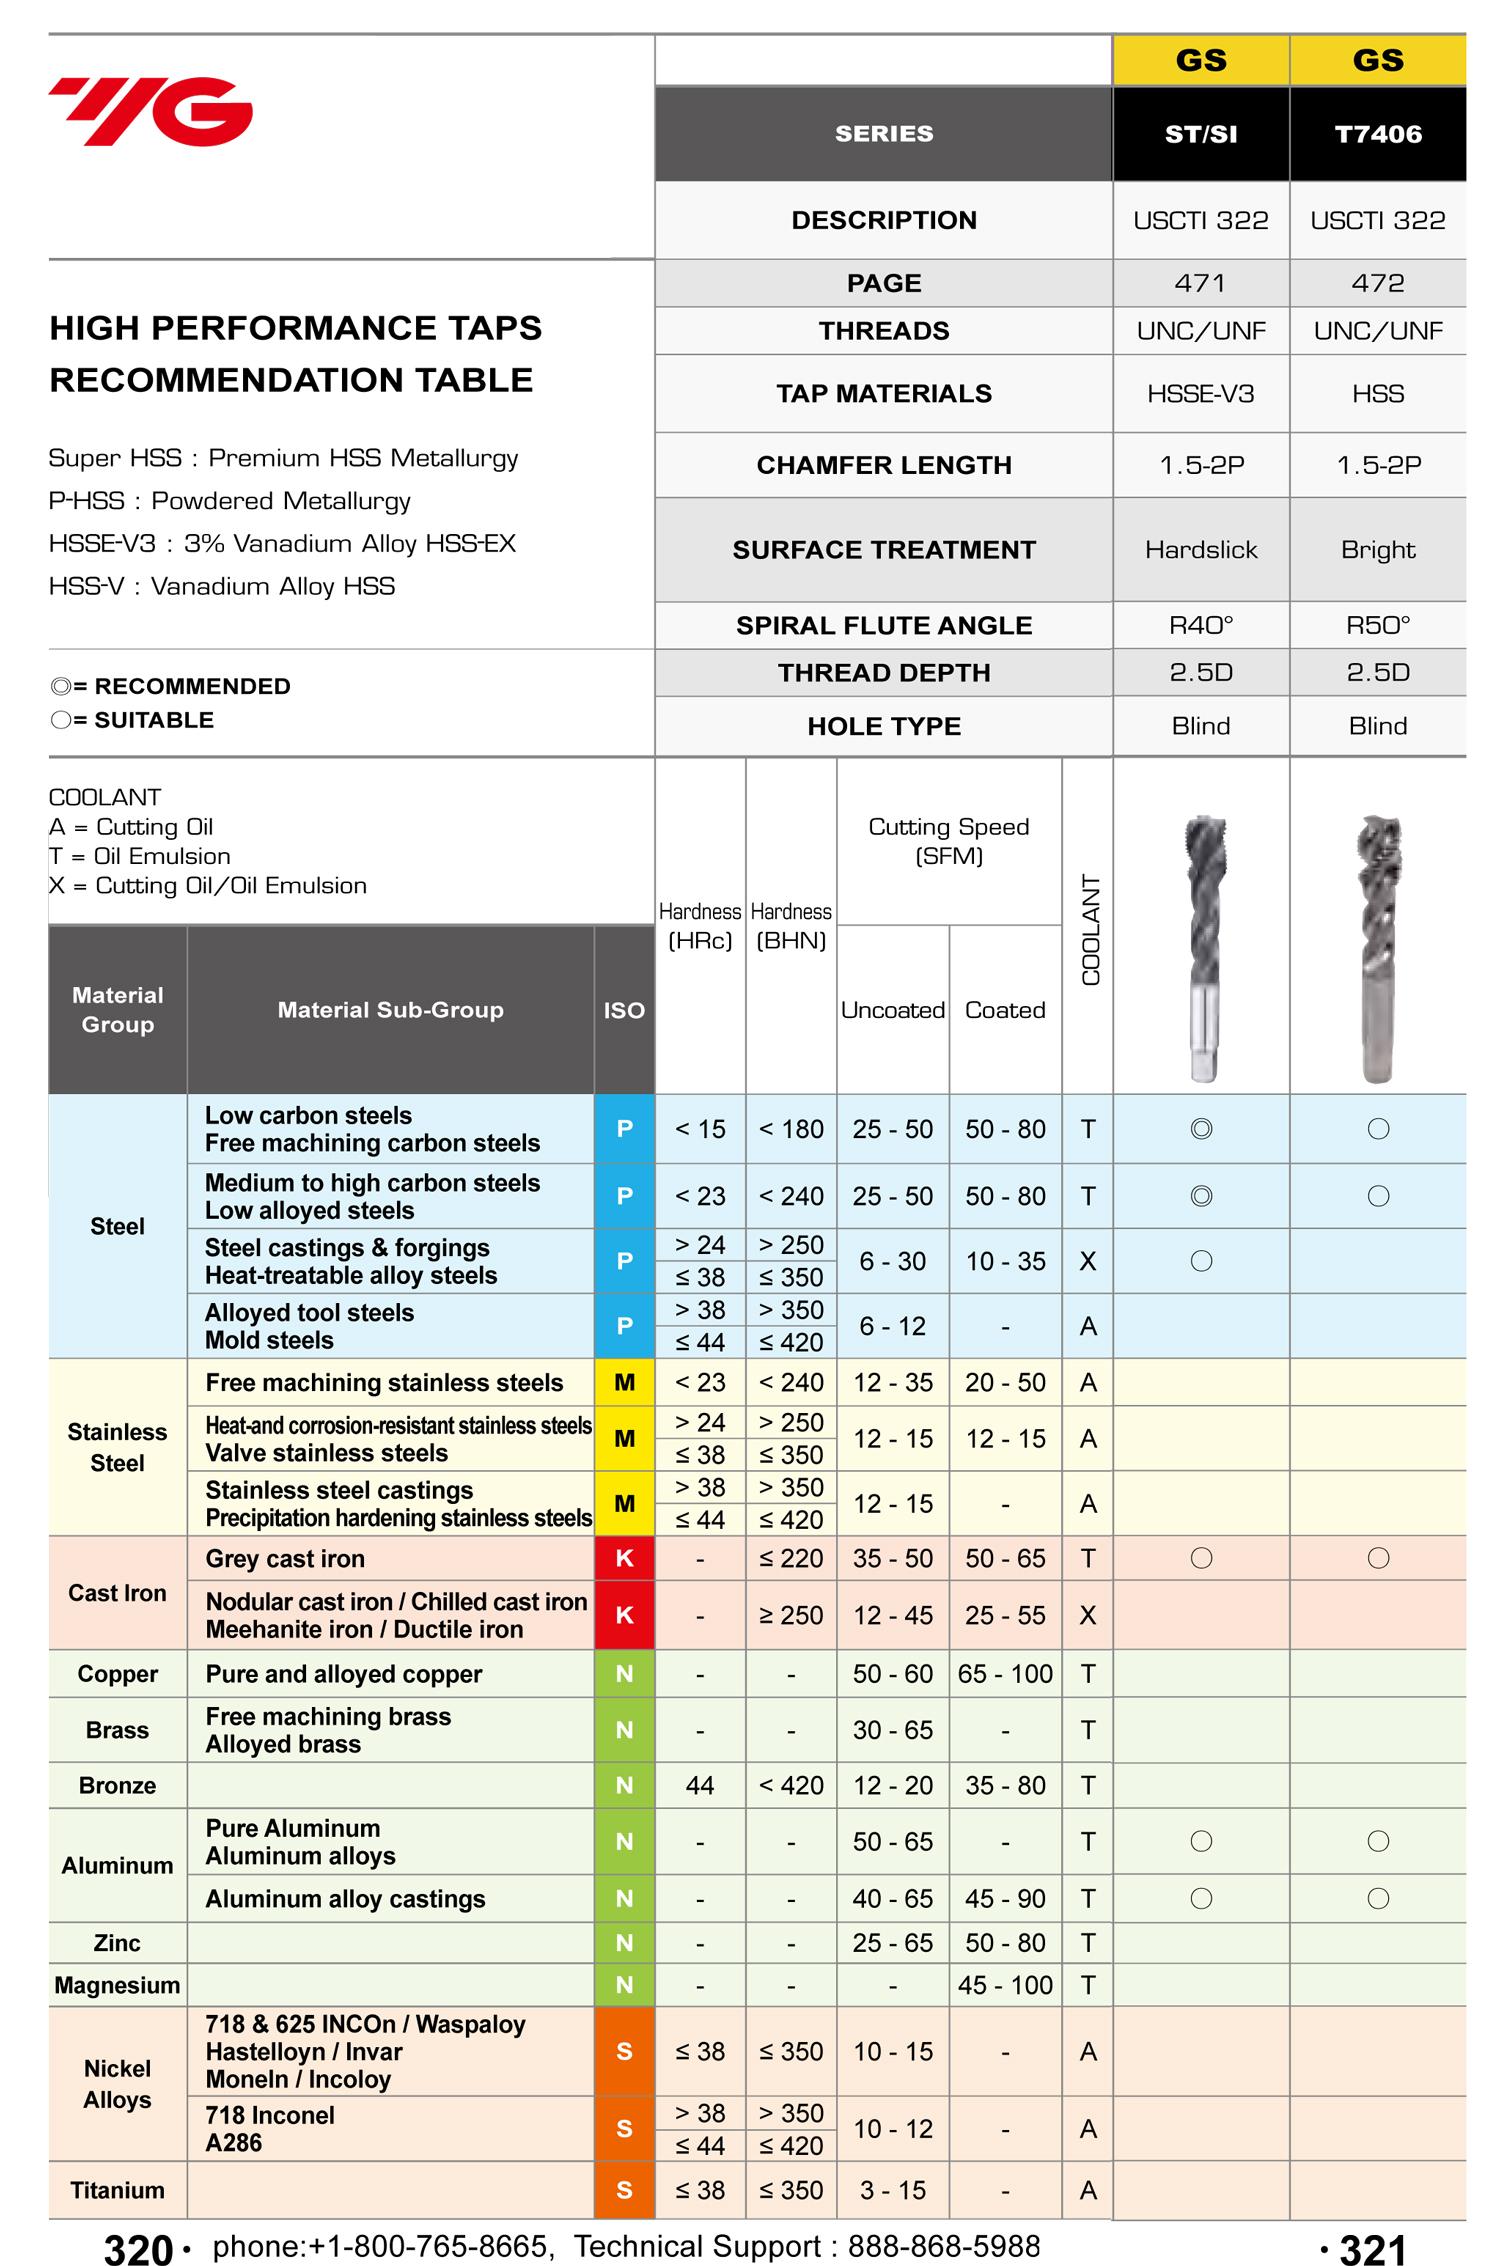 3pcs 2-56 H2 2 Spiral Flutes Bottoming Screw Thread Insert Tap HSS Bright YG1 4